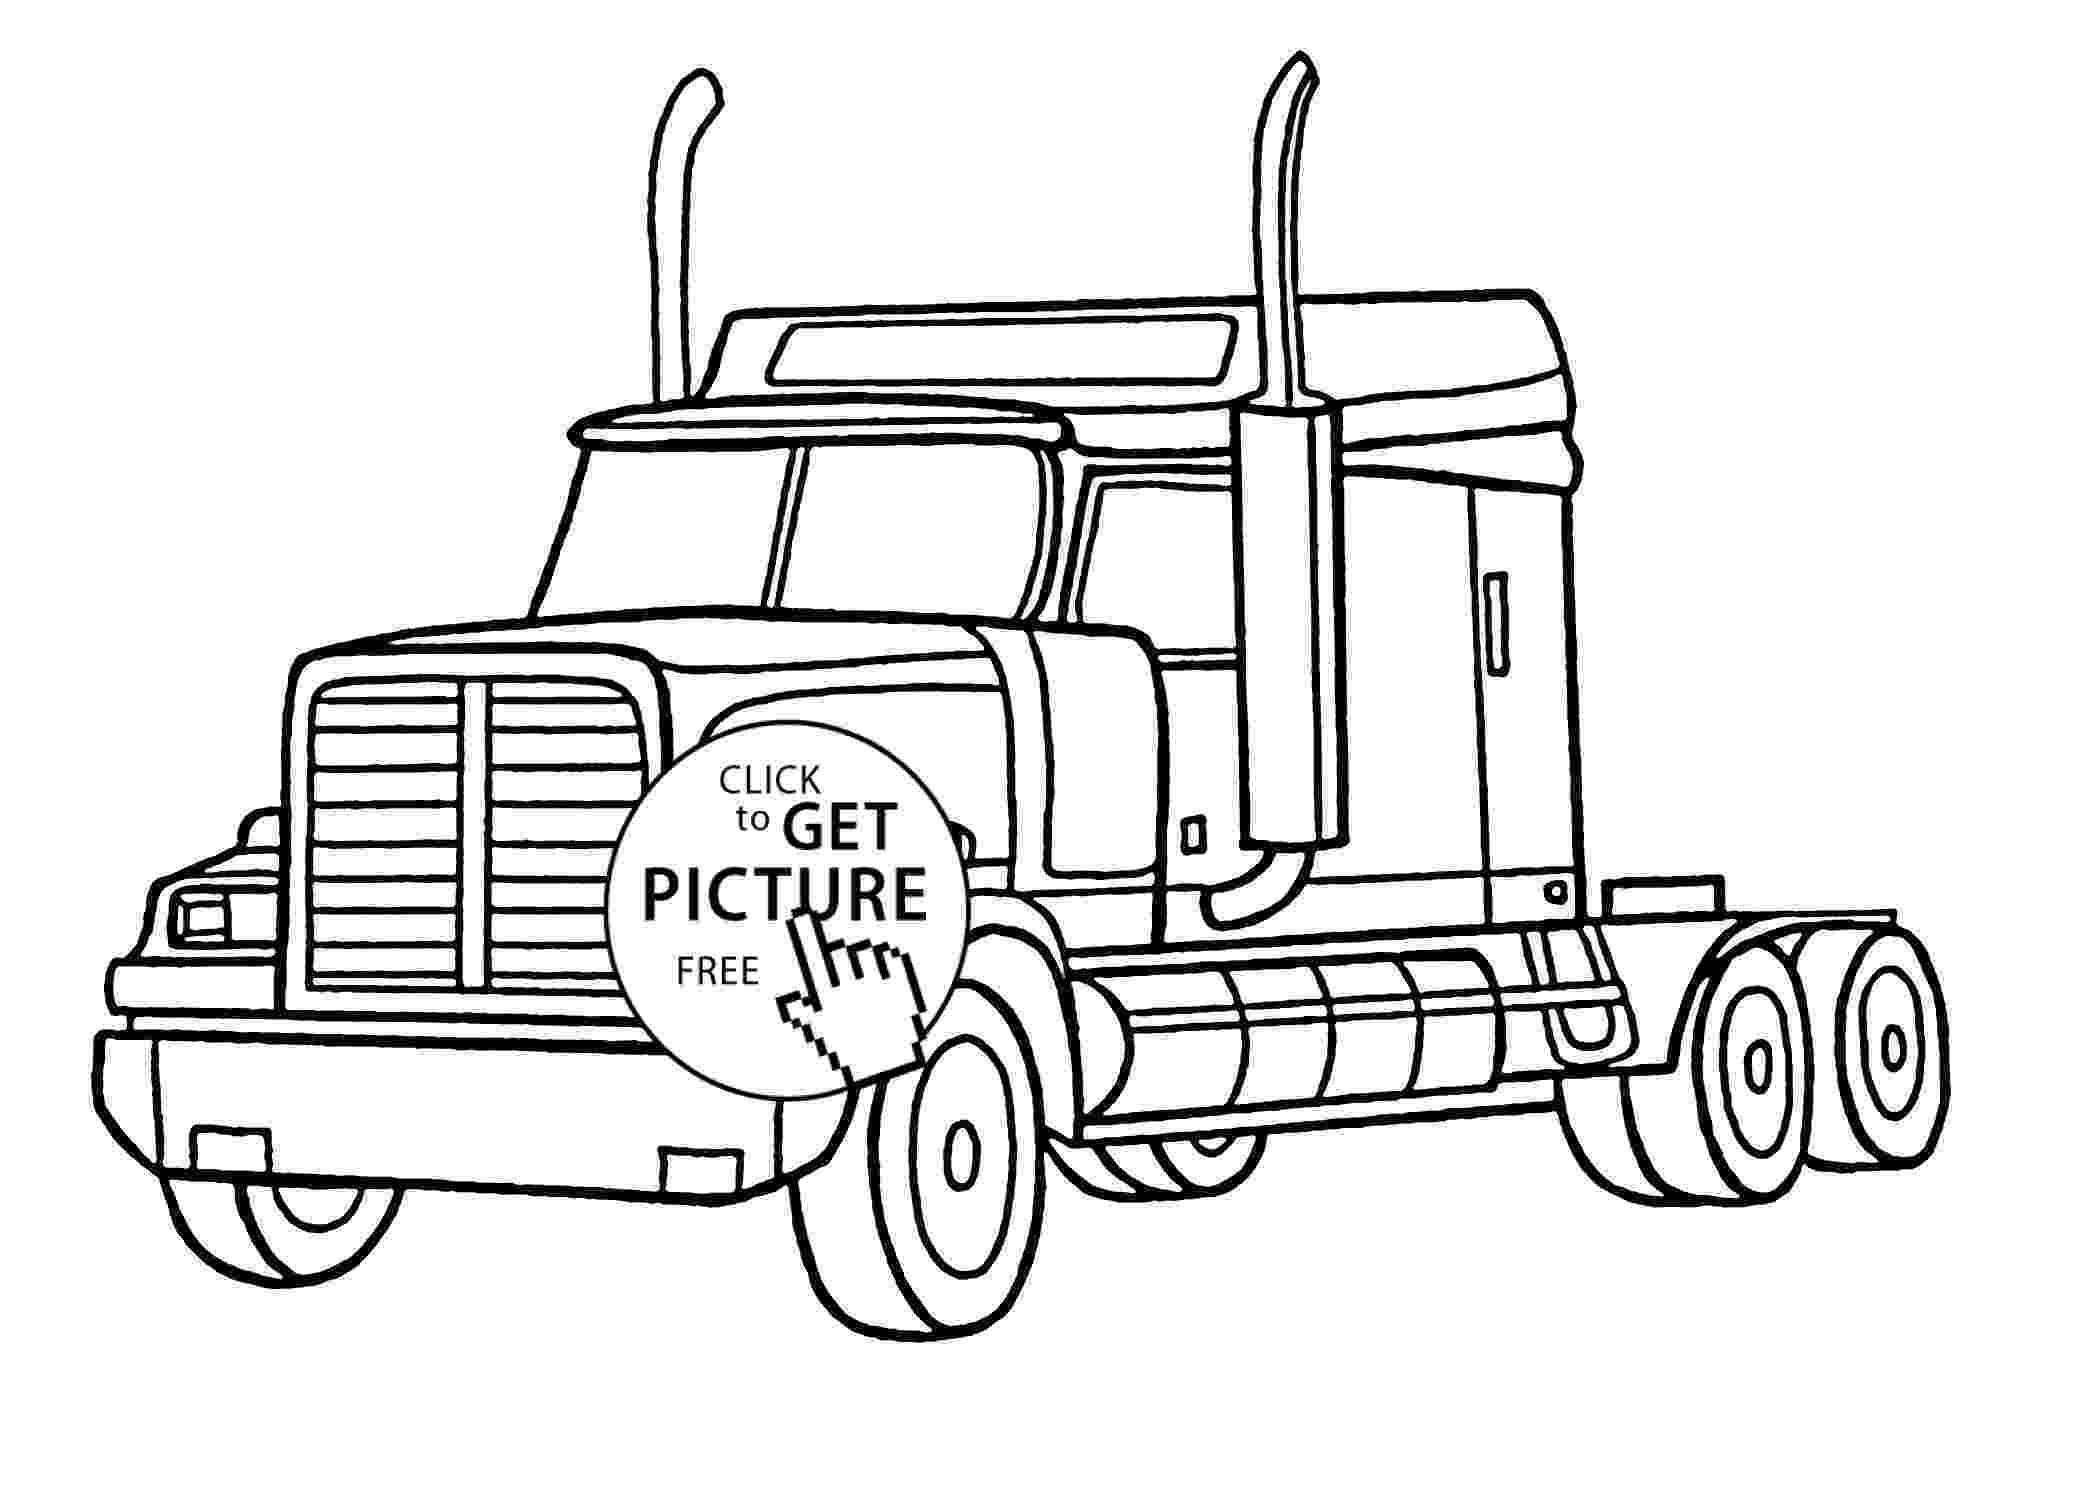 coloring pages of semi trucks semi truck coloring pages to print free coloring books coloring pages of semi trucks 1 1